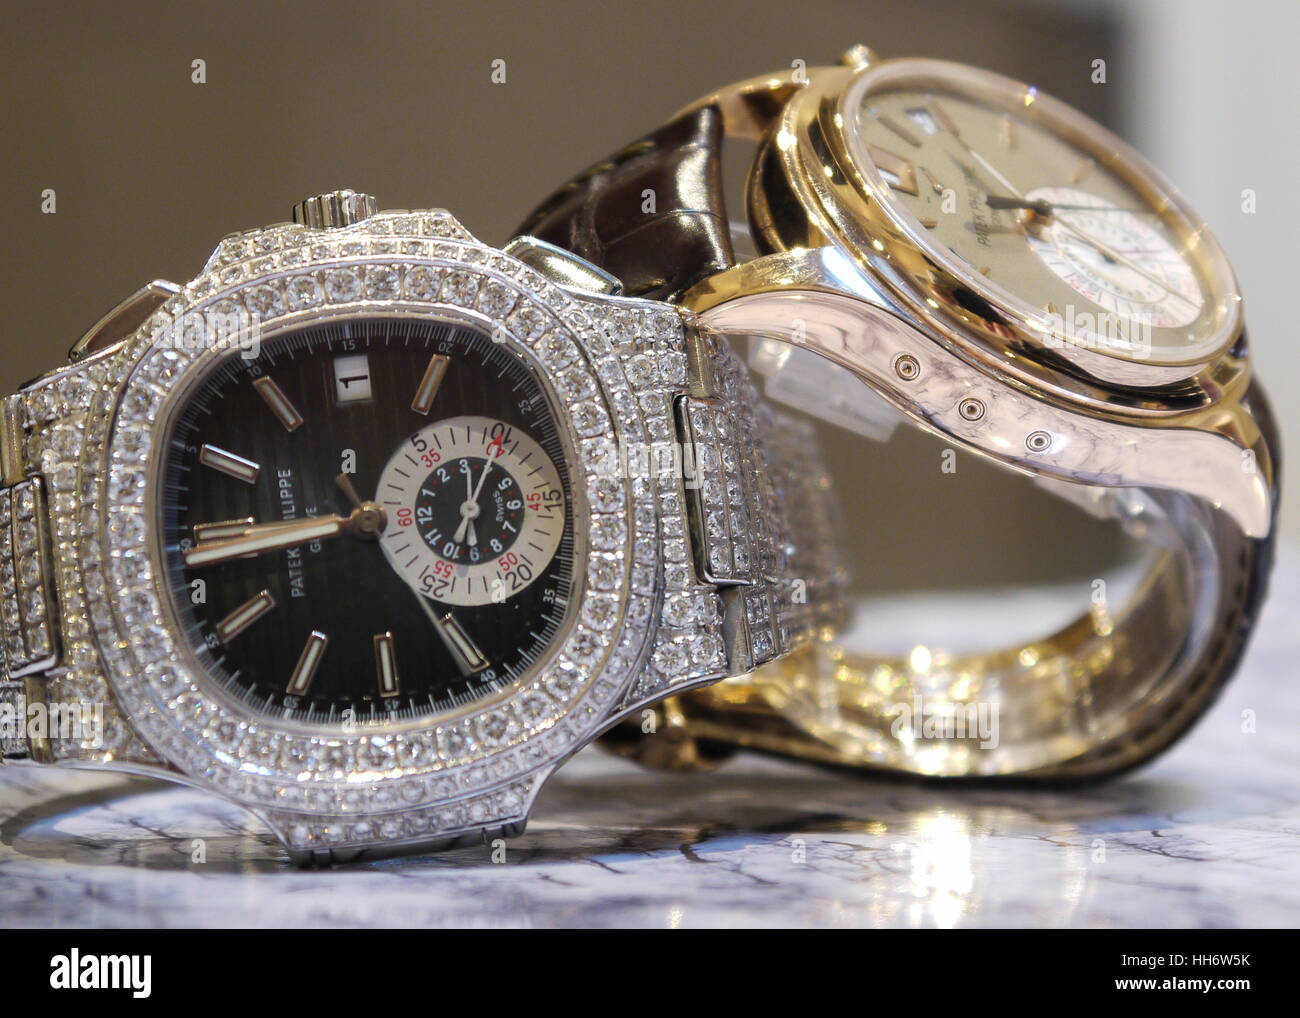 Philippe Patek Wrist Watch - Stock Image